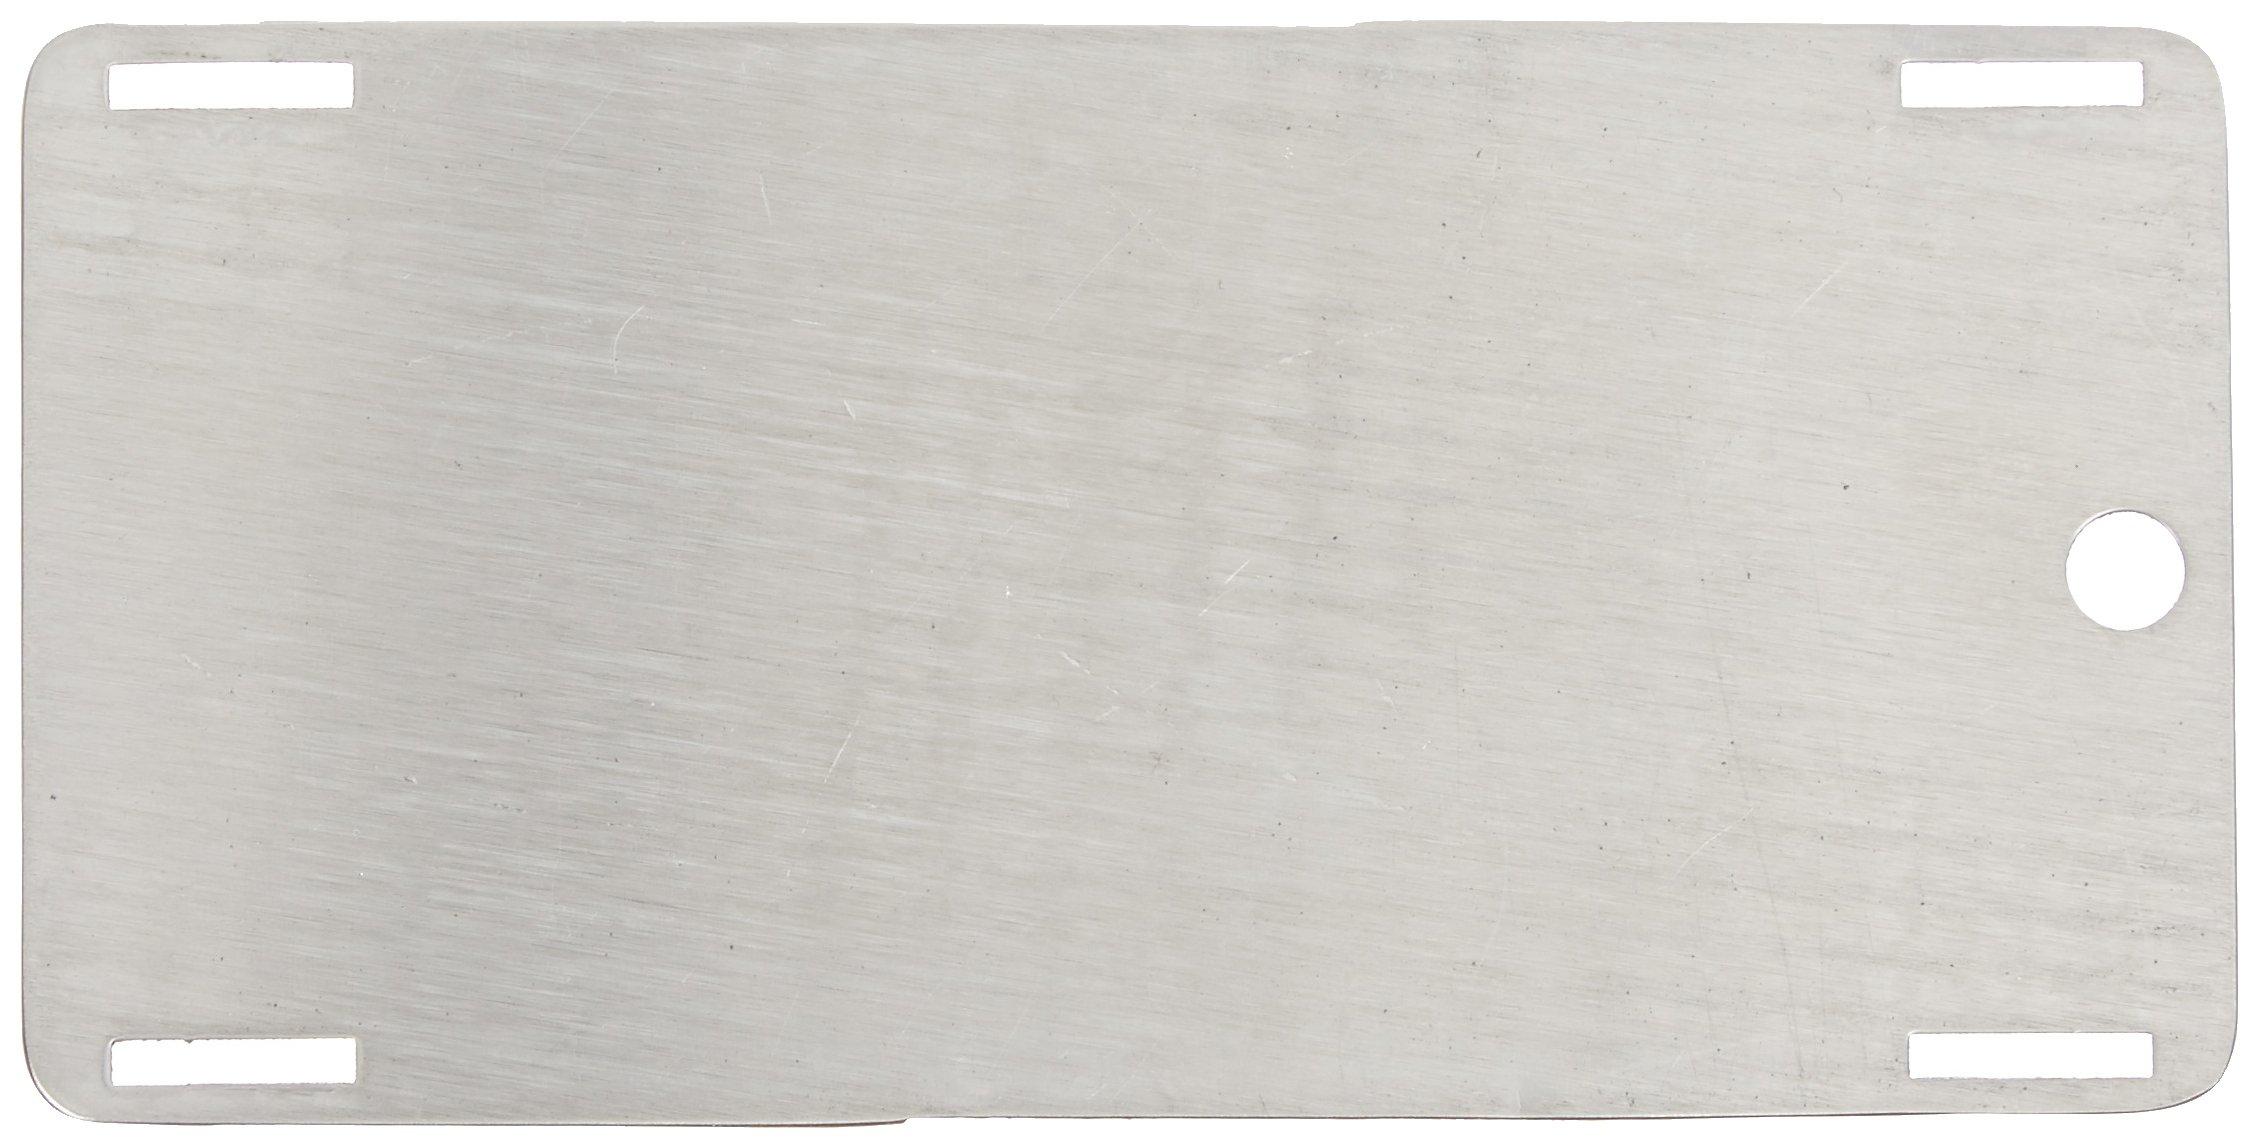 Brady  89227 5'' Width x 2 1/2'' Height, Stainless Steel (B-748), Blank Stainless Steel (HEET) Tags (10 Tags)